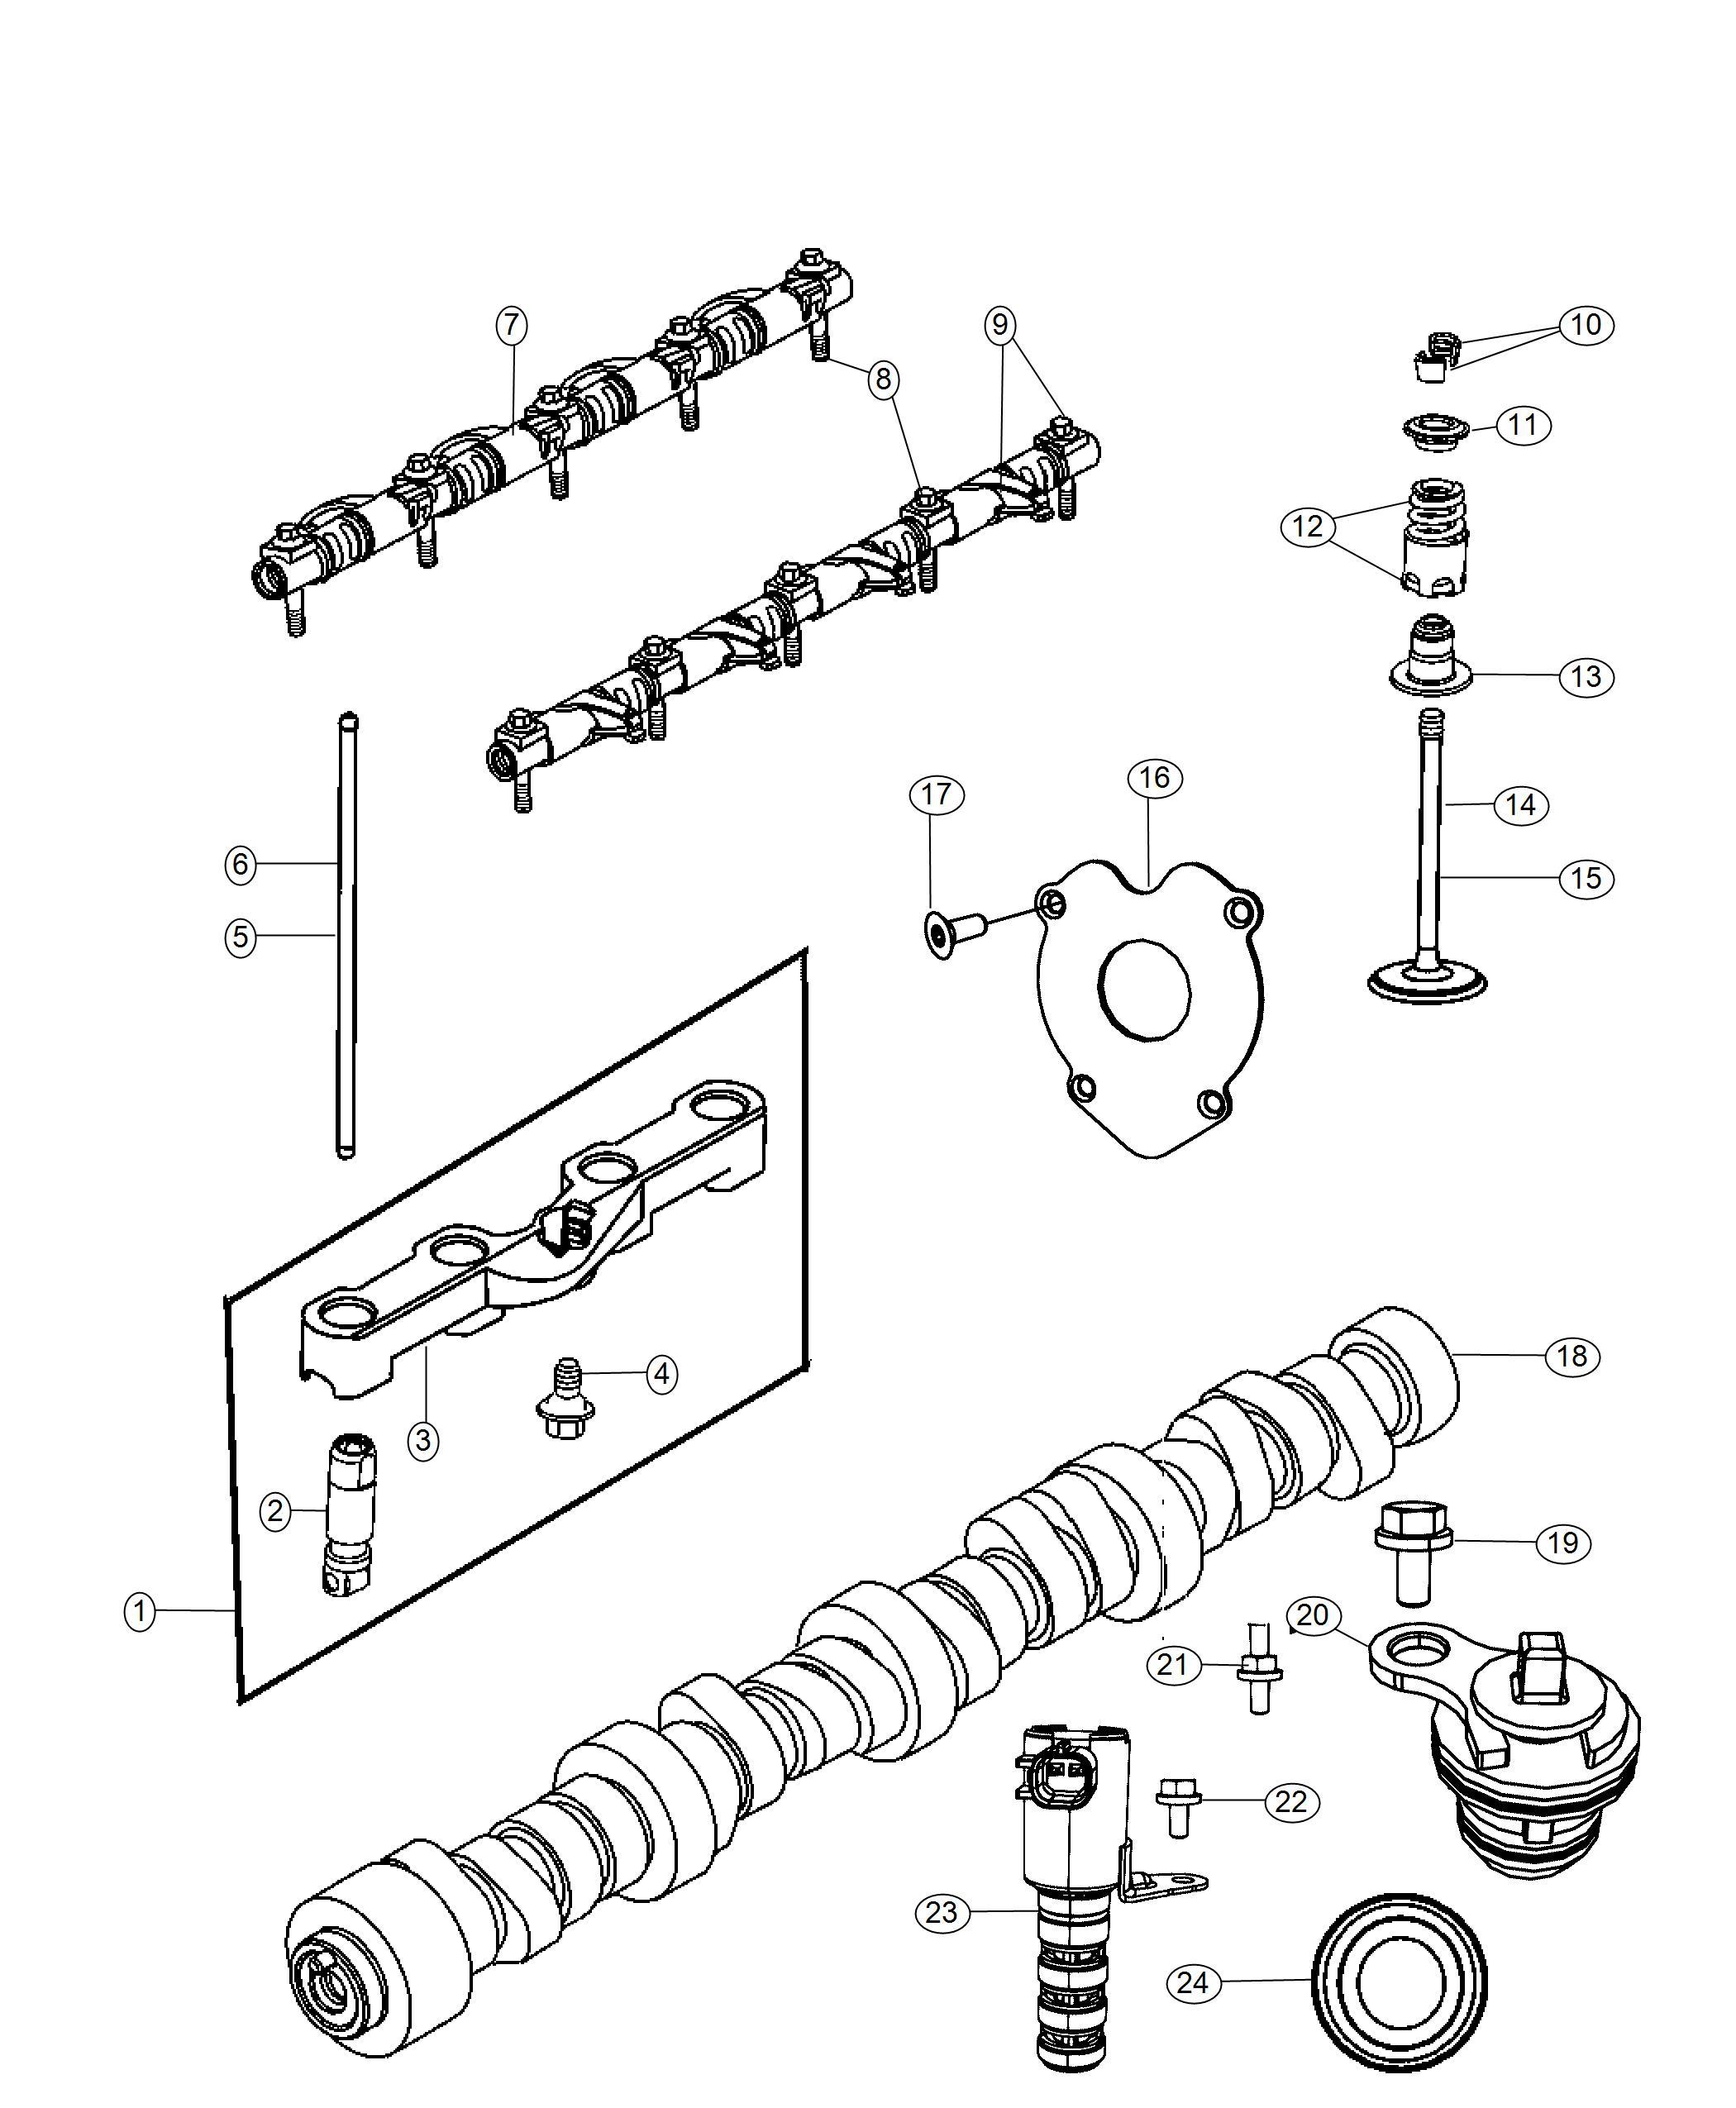 Ram Camshaft Engine Valvetrain Ezc Cng